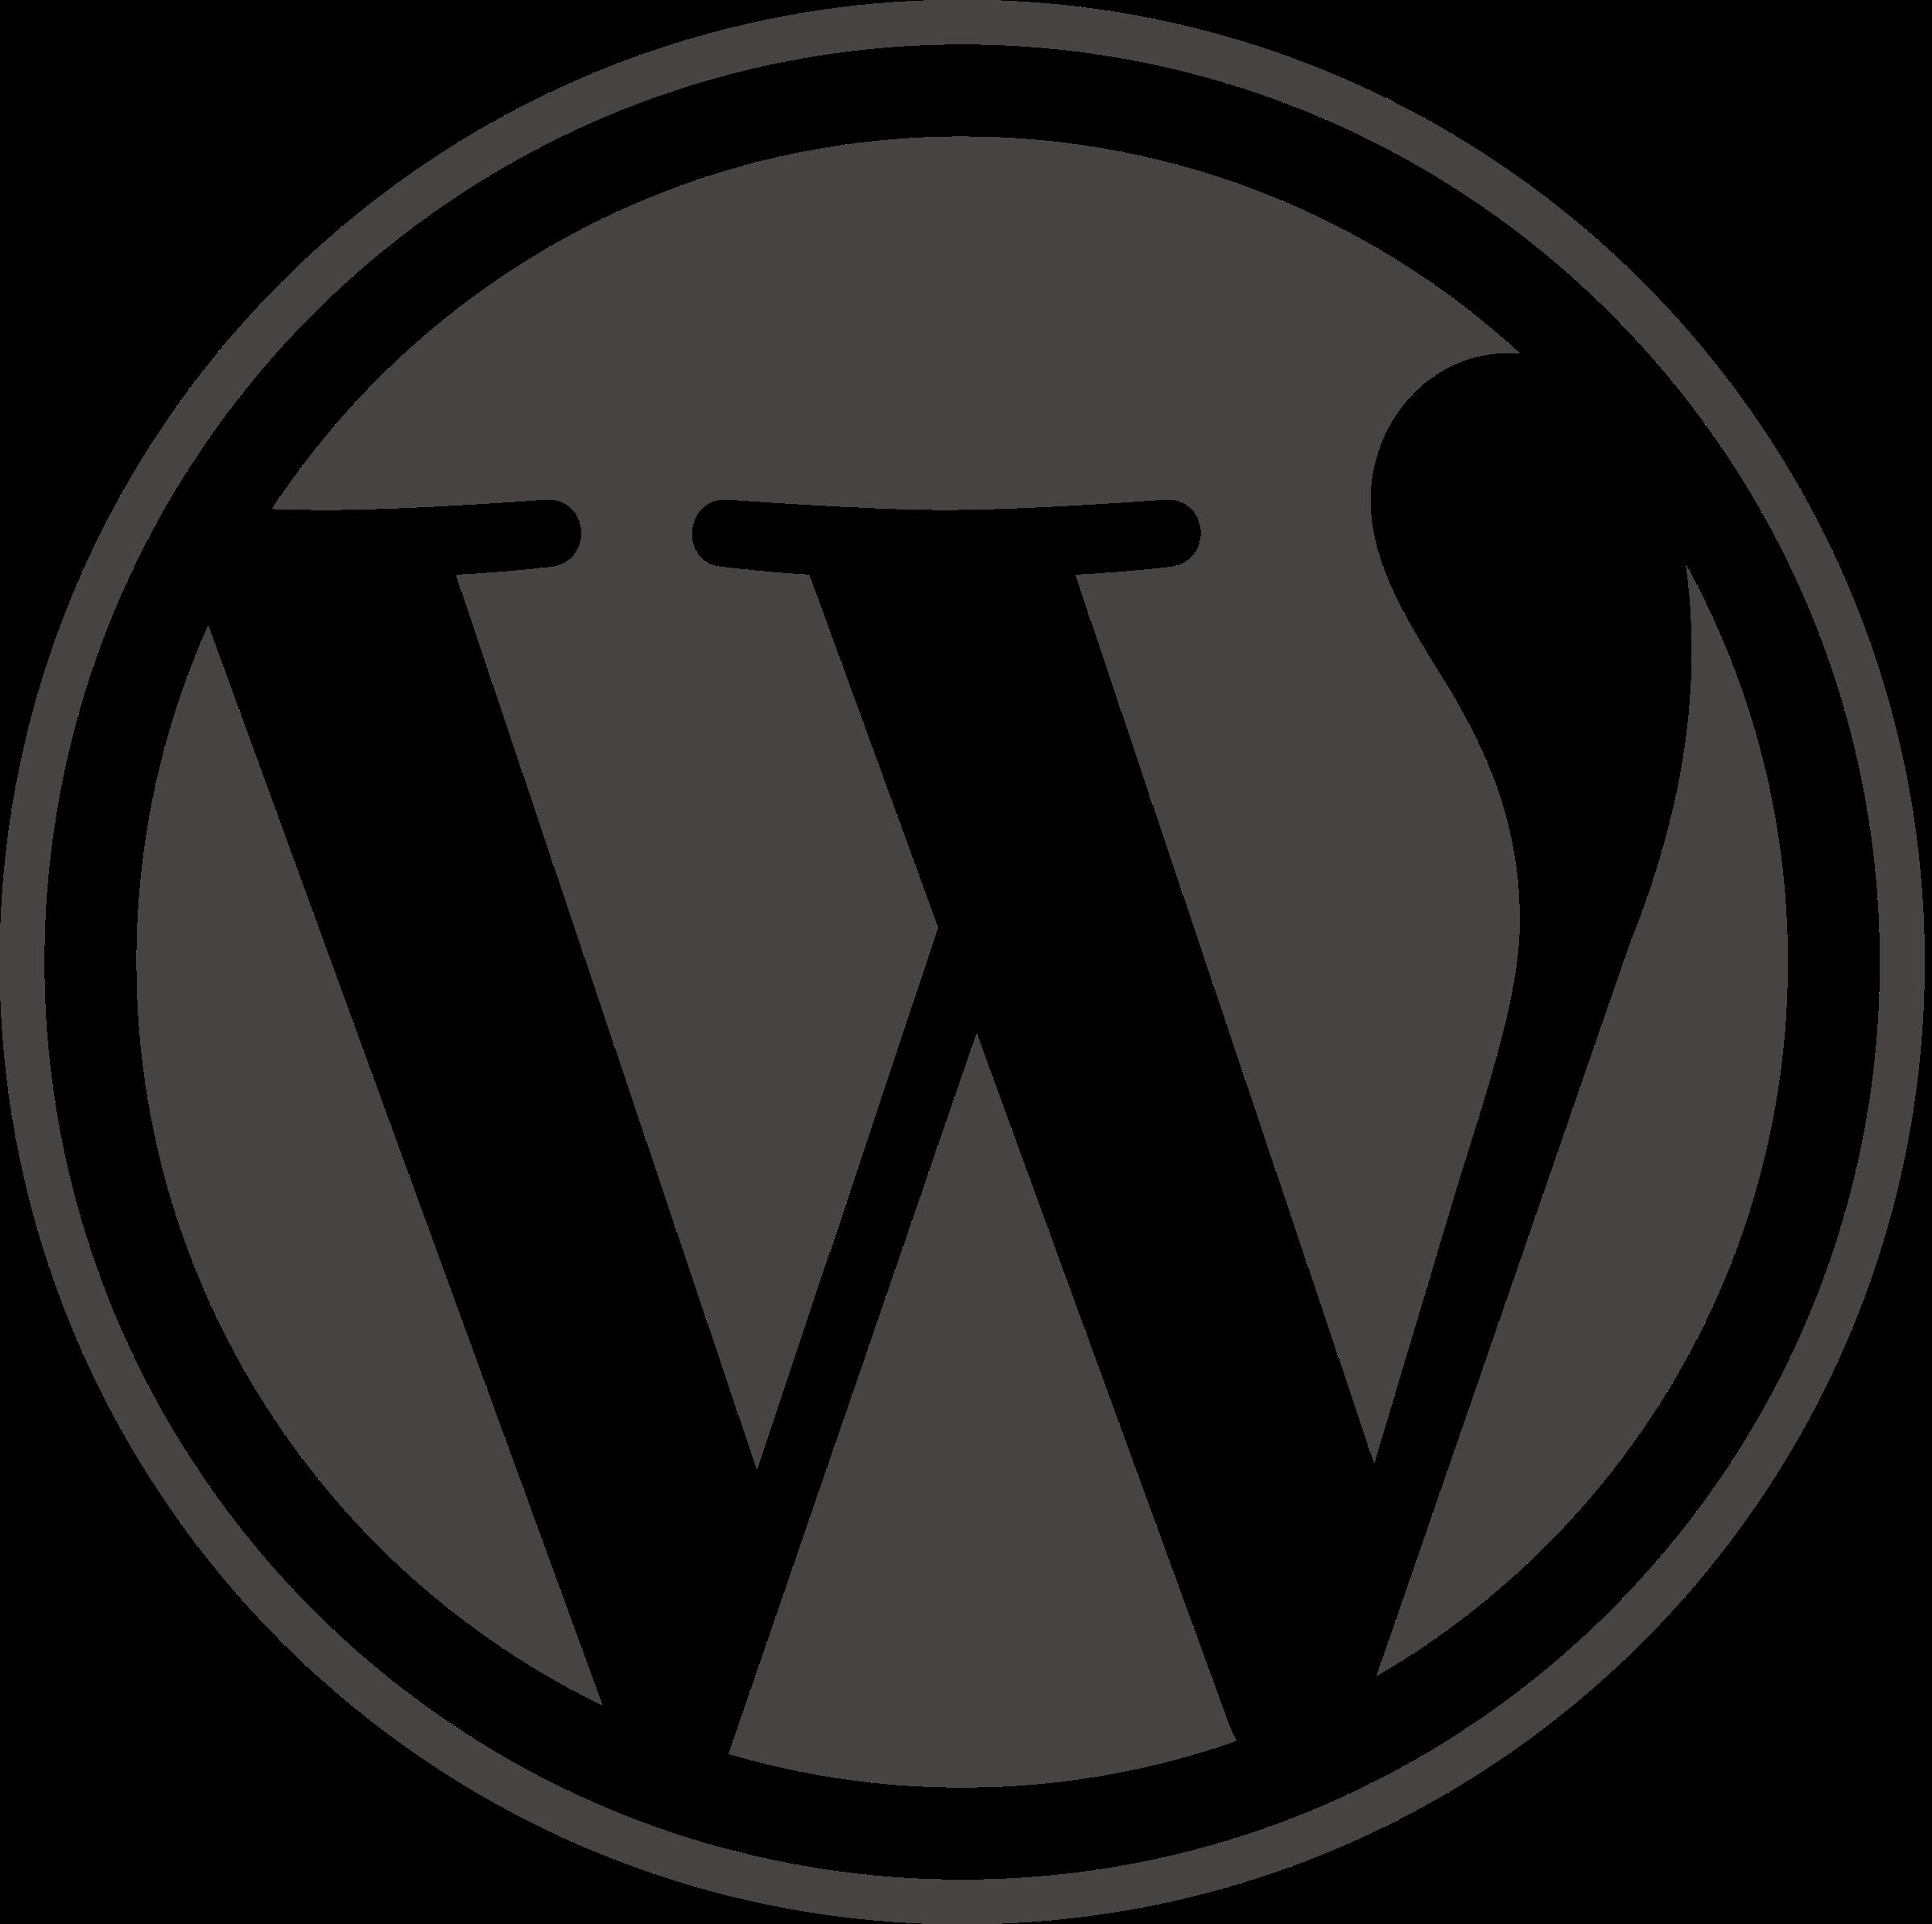 Wordpress icon Logo PNG Transparent & SVG Vector - Freebie ...